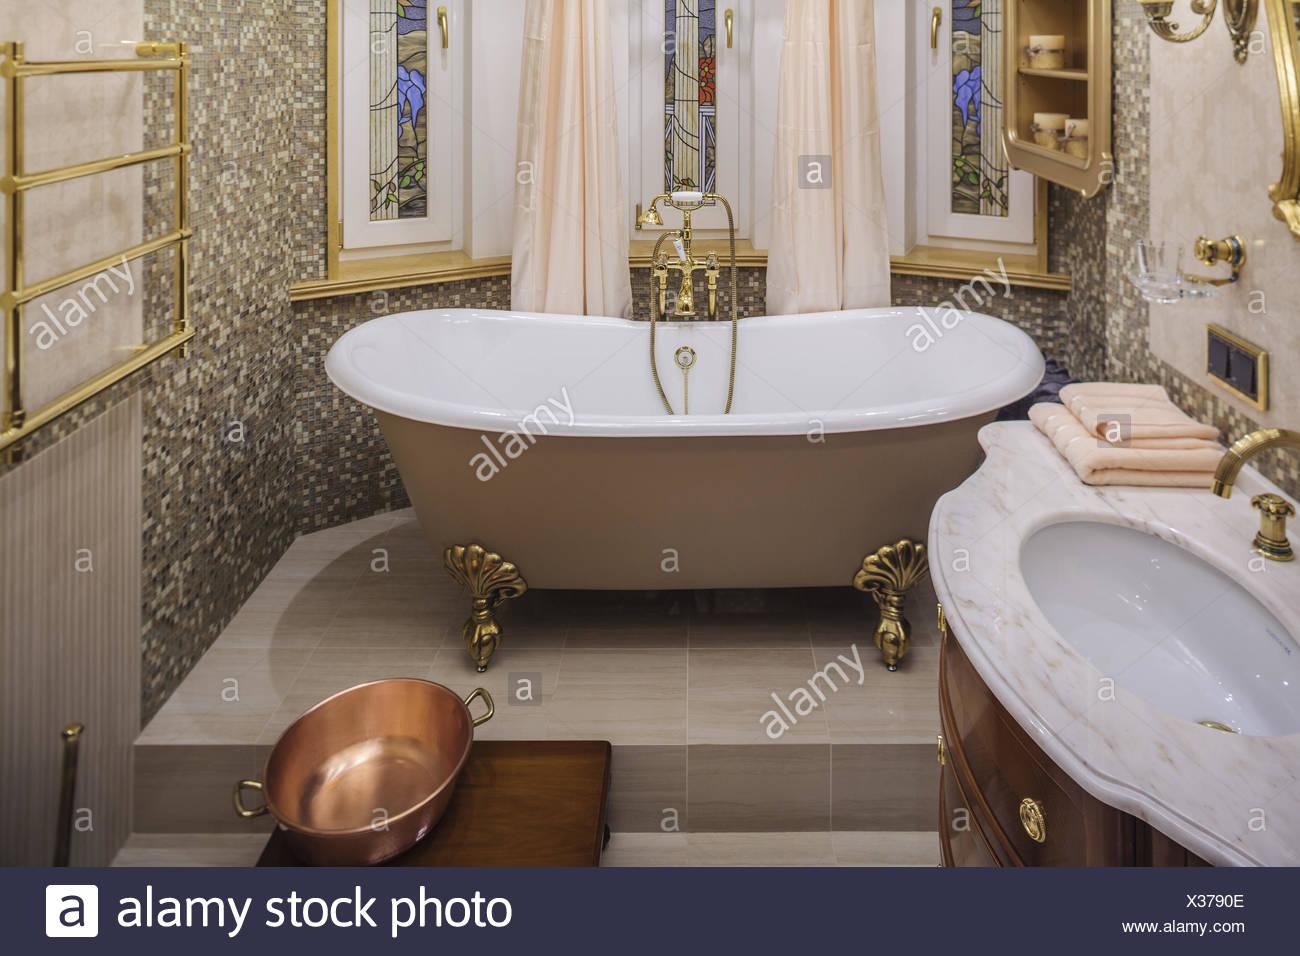 Oxydation Salle De Bain ~ old copper bathroom tap photos old copper bathroom tap images alamy